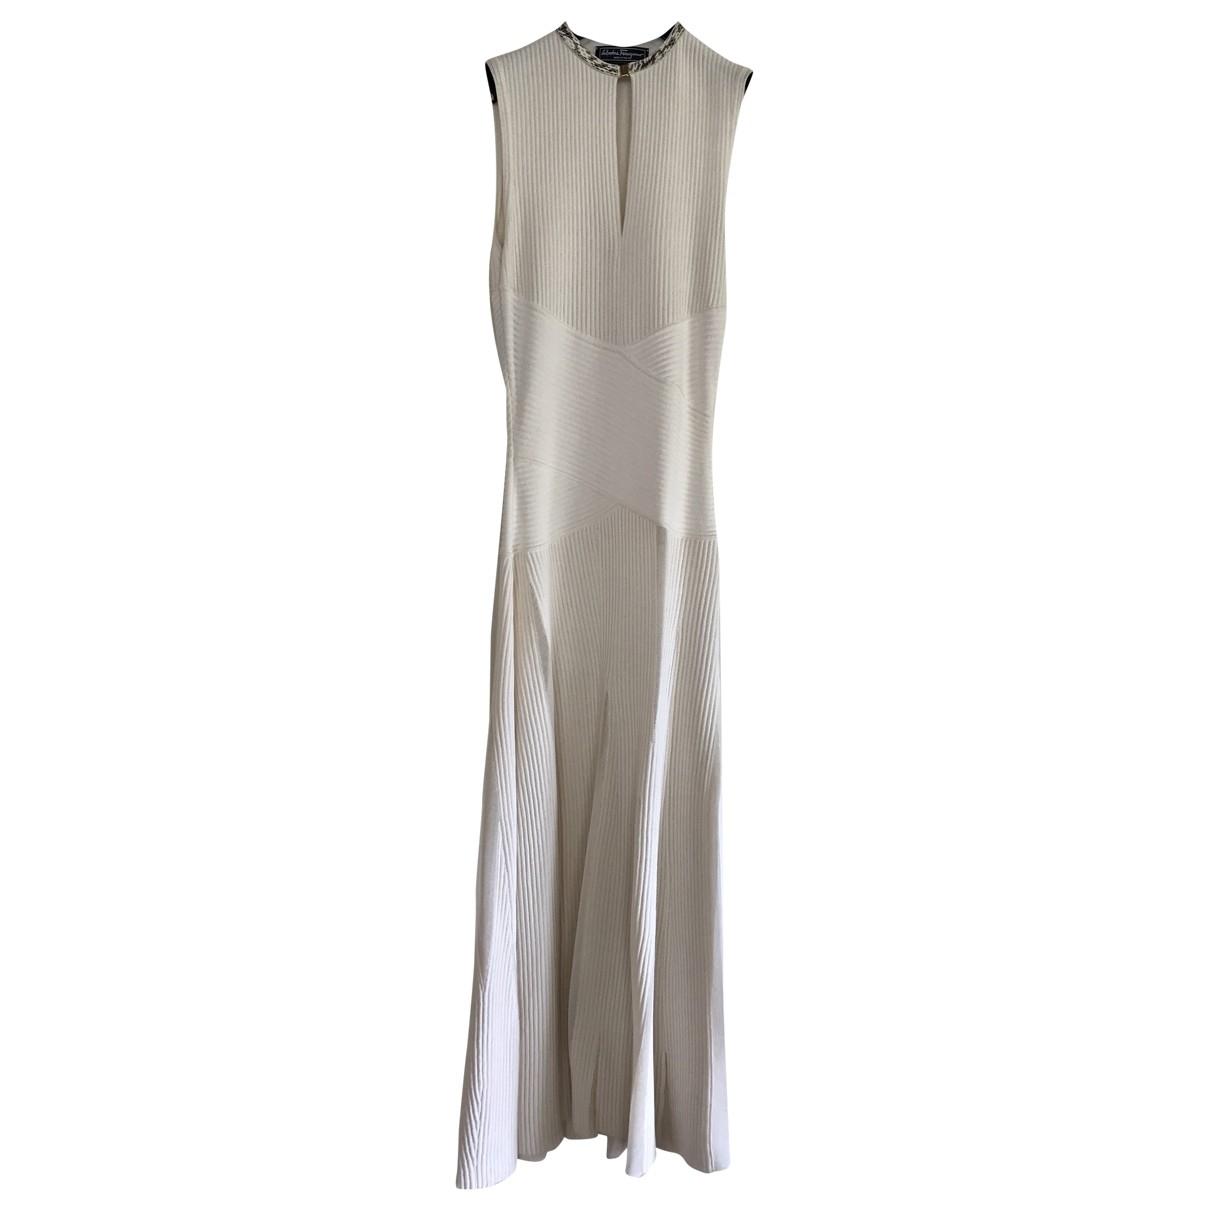 Salvatore Ferragamo \N Beige Silk dress for Women S International